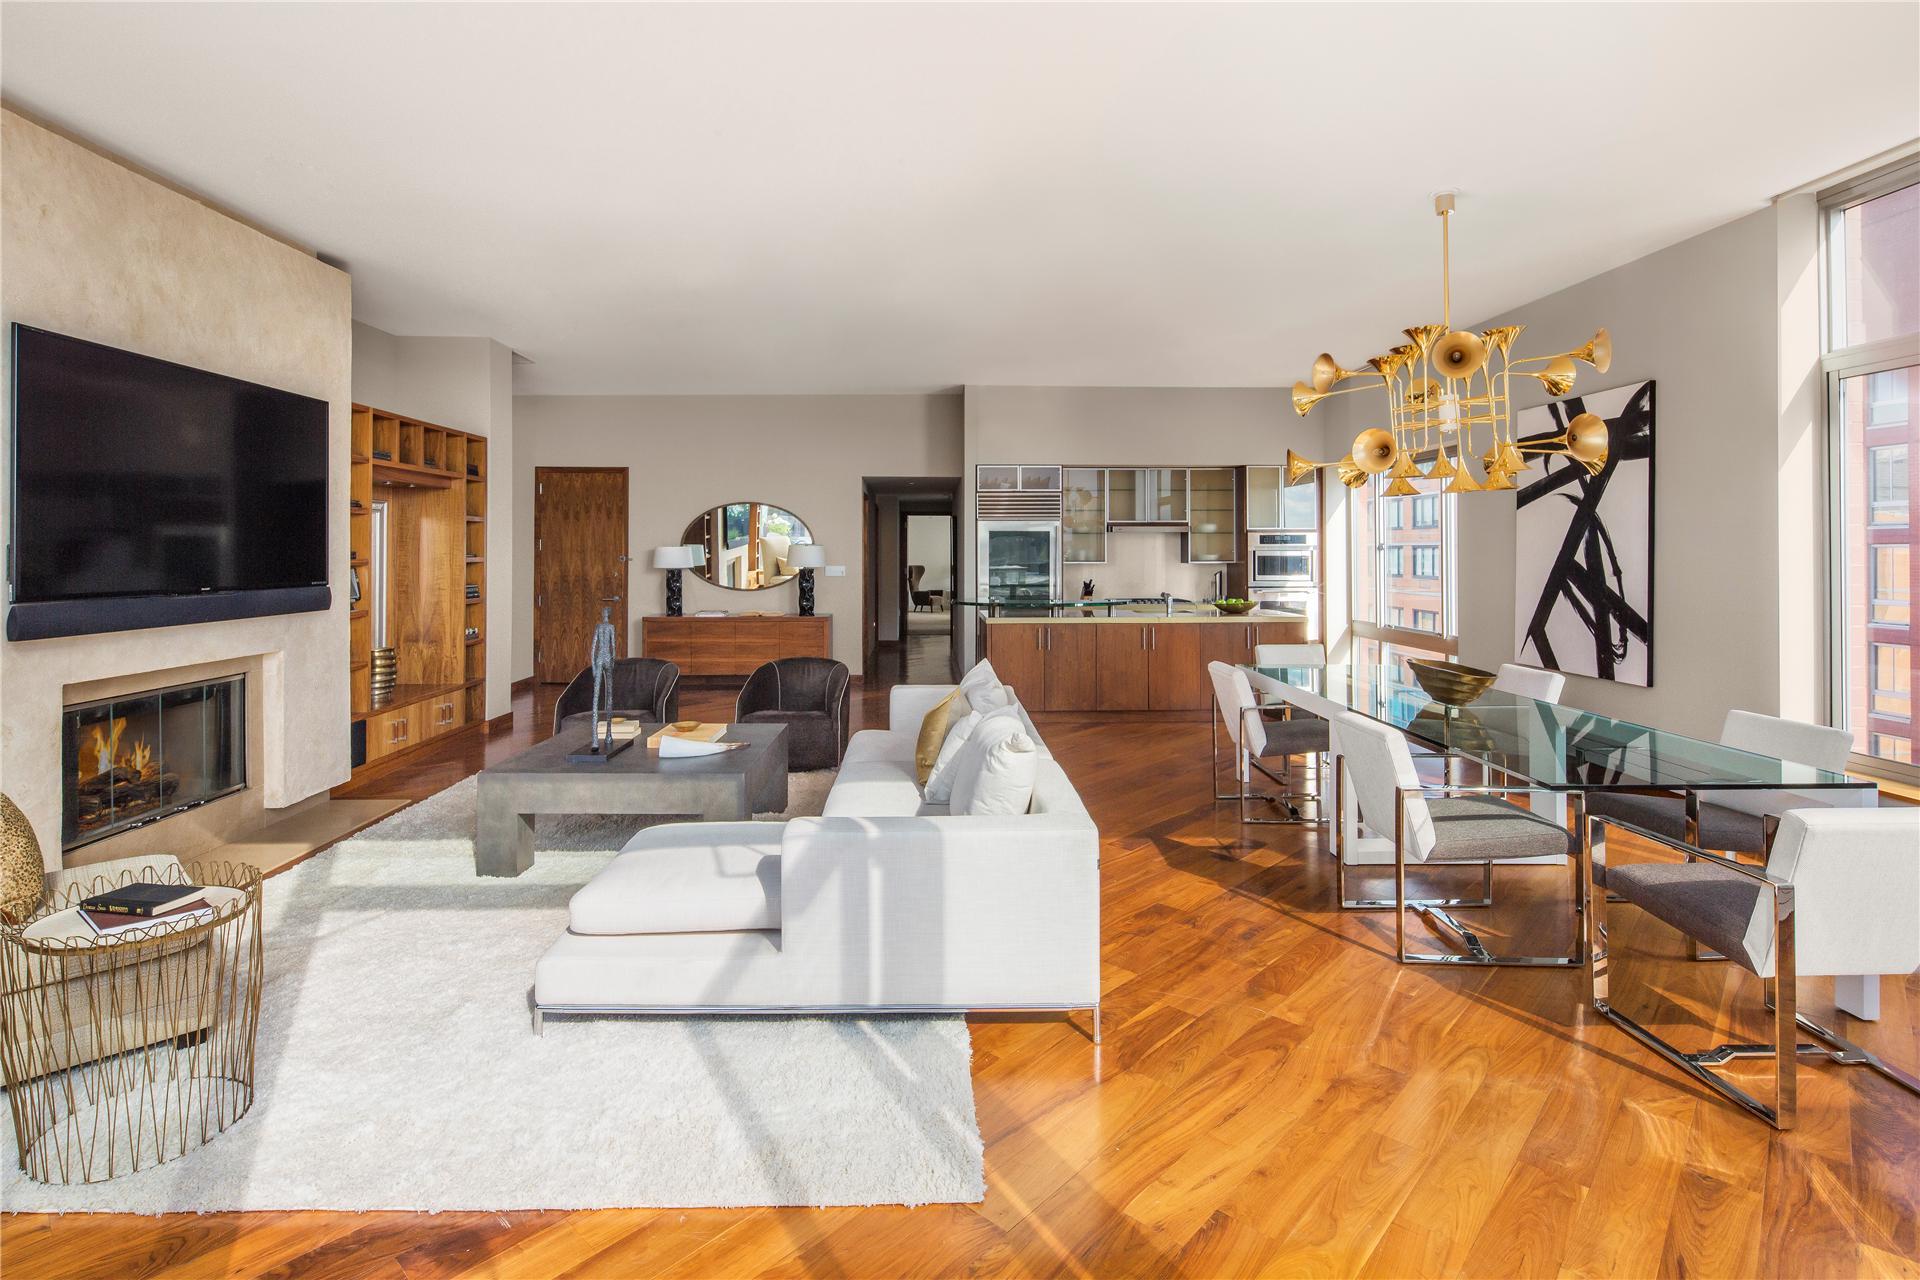 555 west 23rd street pha property listings alexander for 70 park terrace east new york ny